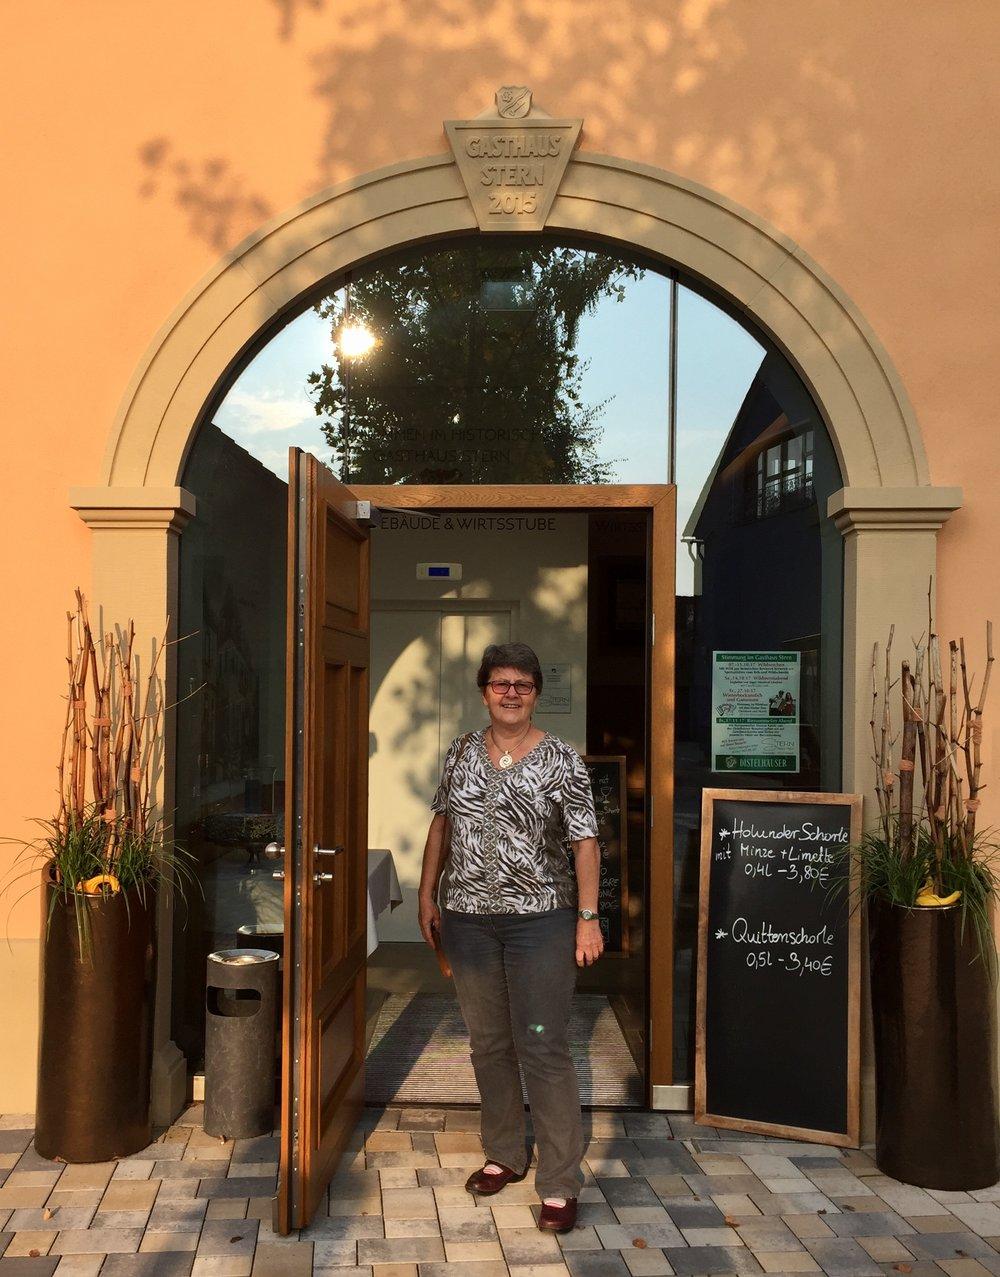 Når vi kom til Kürnach så dro vi innom restaurant Stern. Der ville jeg kunne få stempel i mitt pilegrimspass.